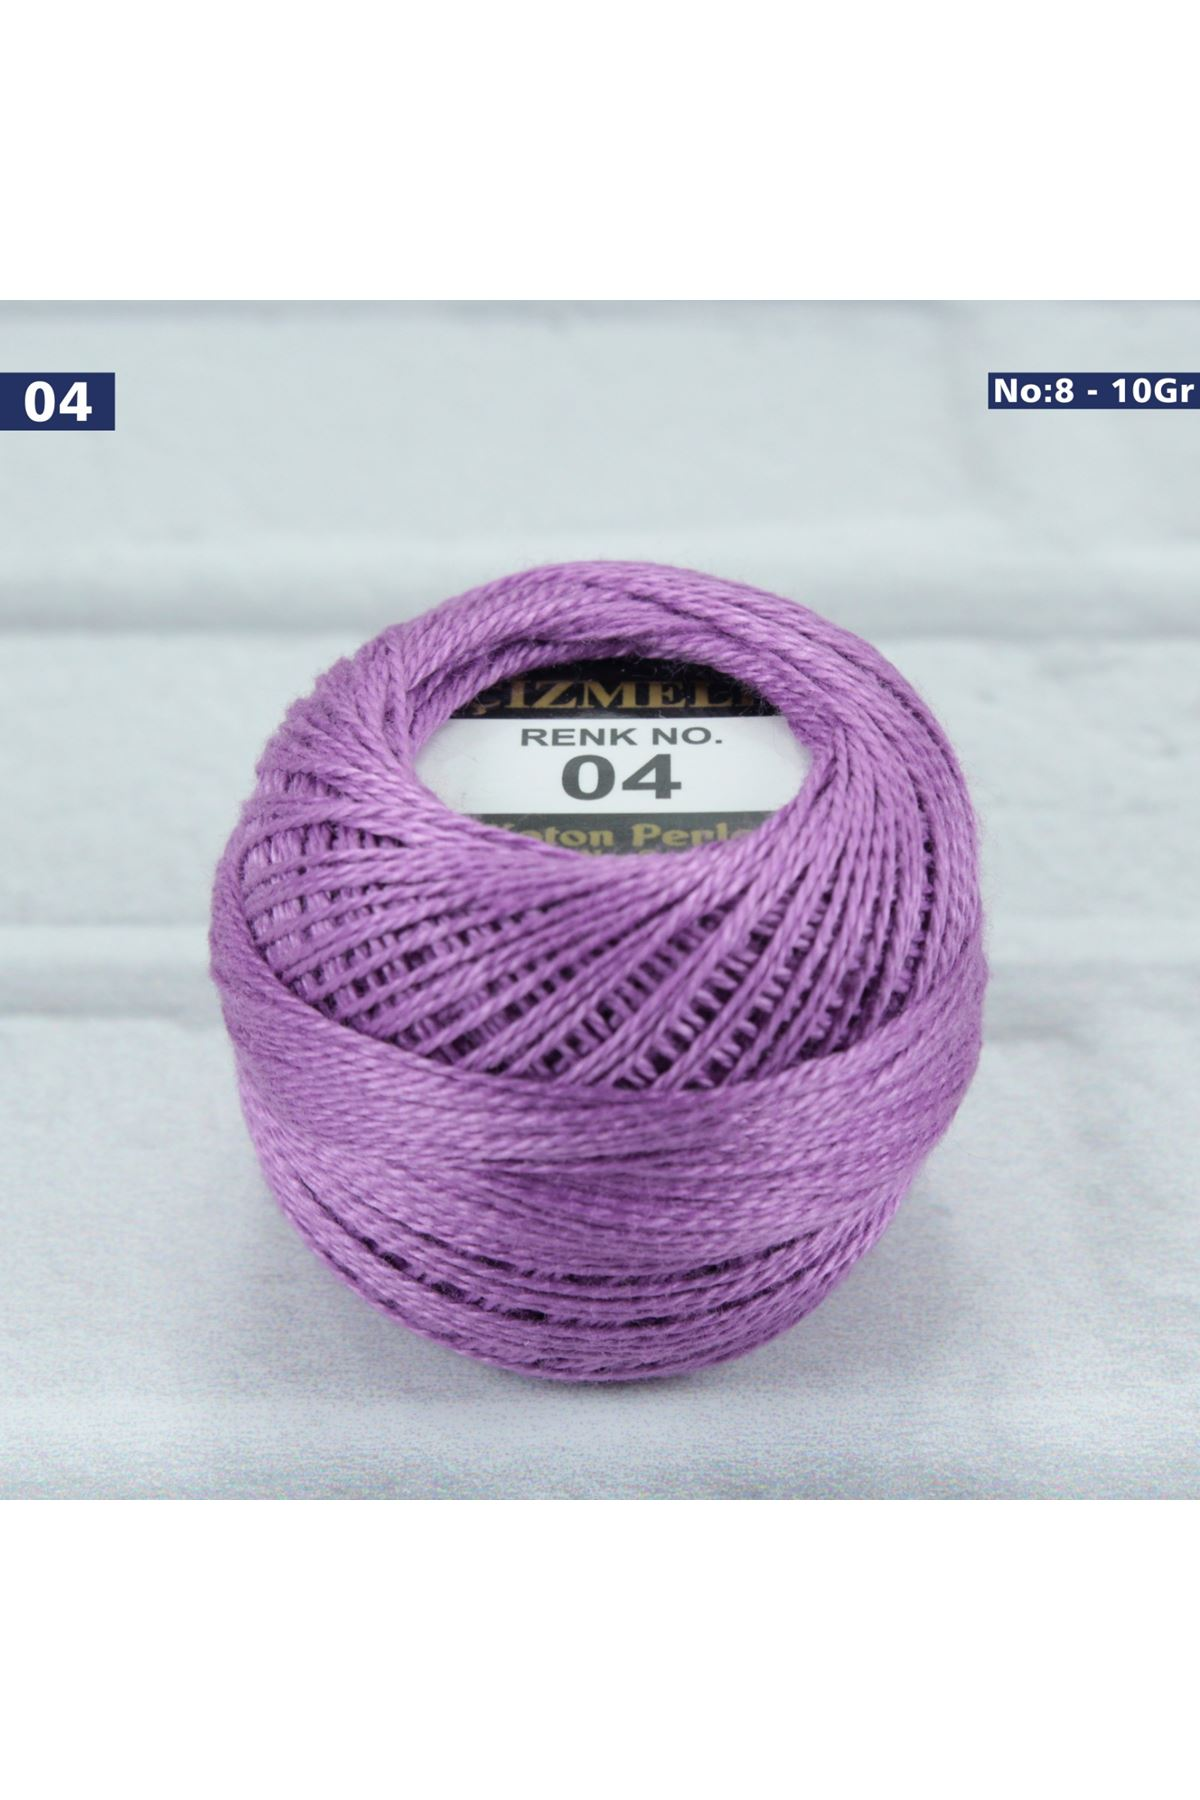 Çizmeli Cotton Perle Nakış İpliği No: 004